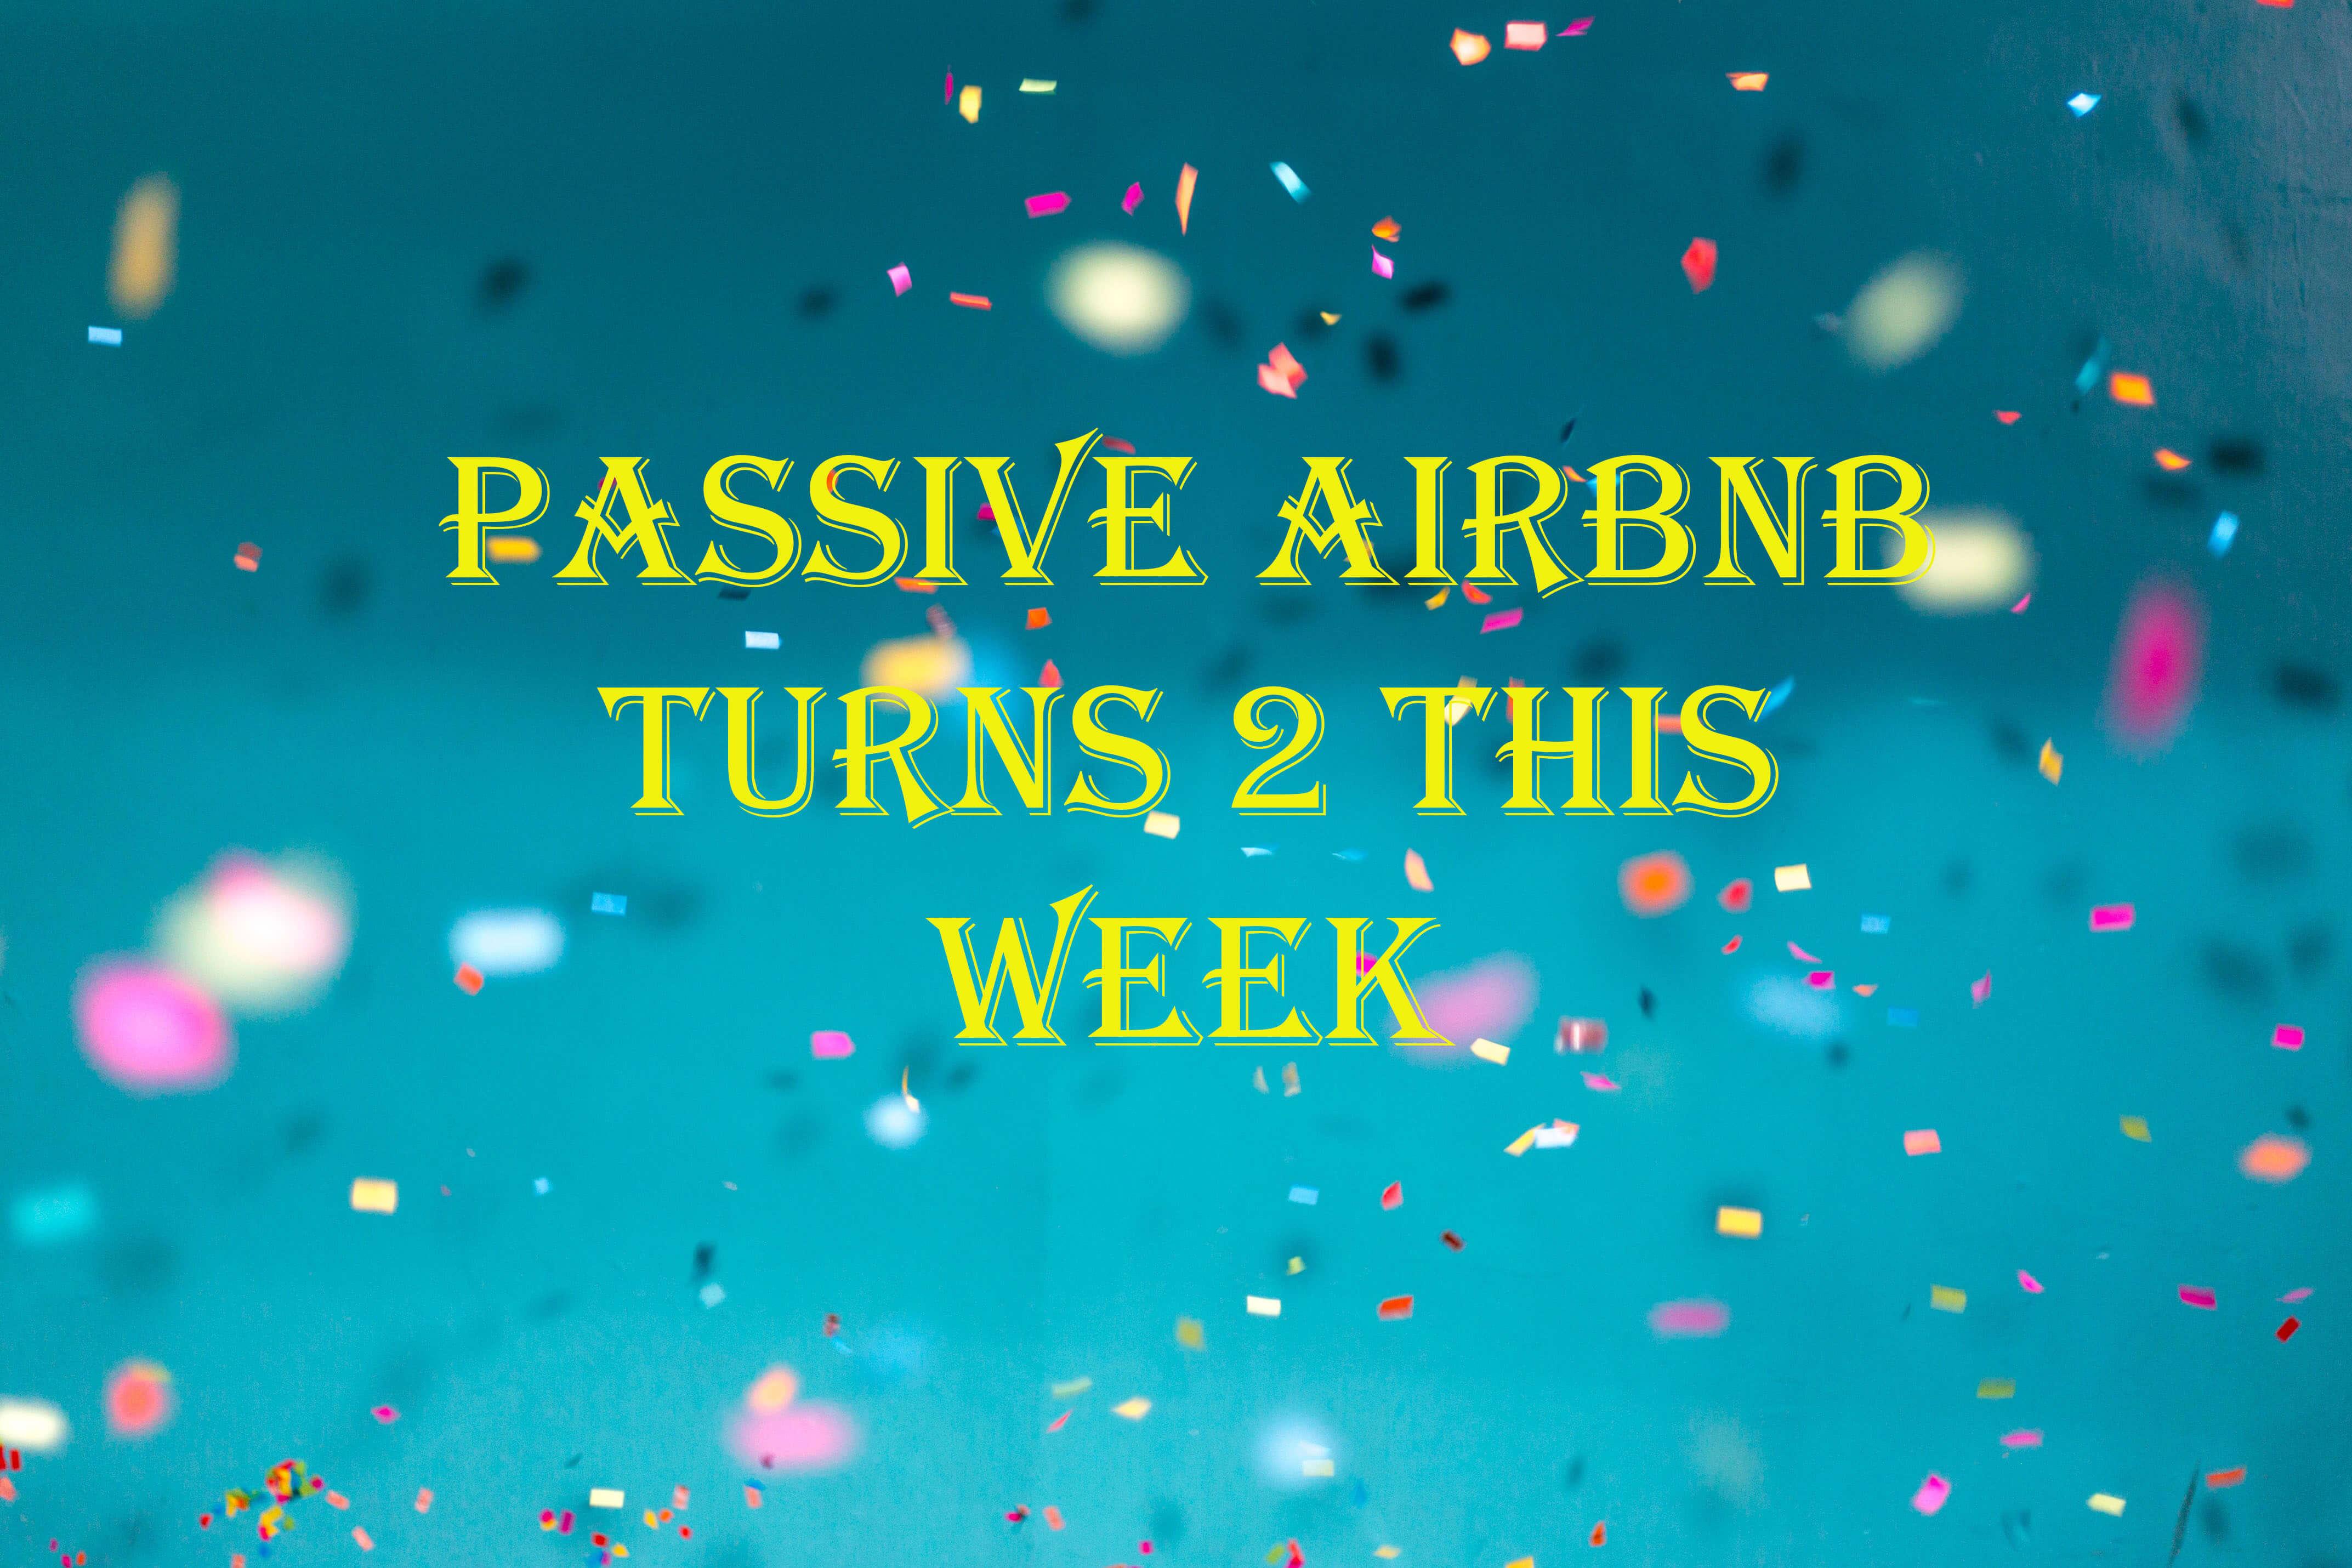 Passive Airbnb